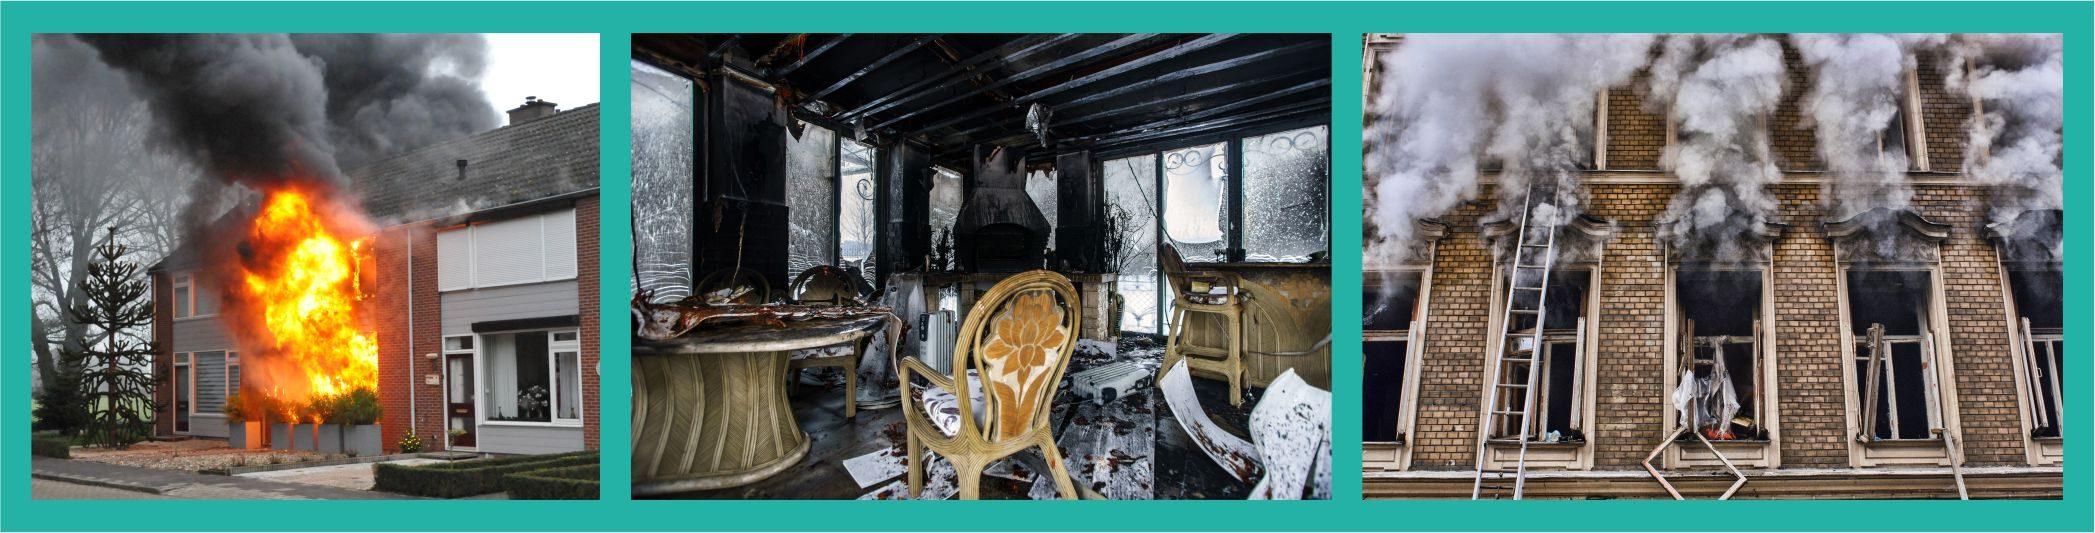 brandschade tegenexpert huisbrand prive expert huisbrand